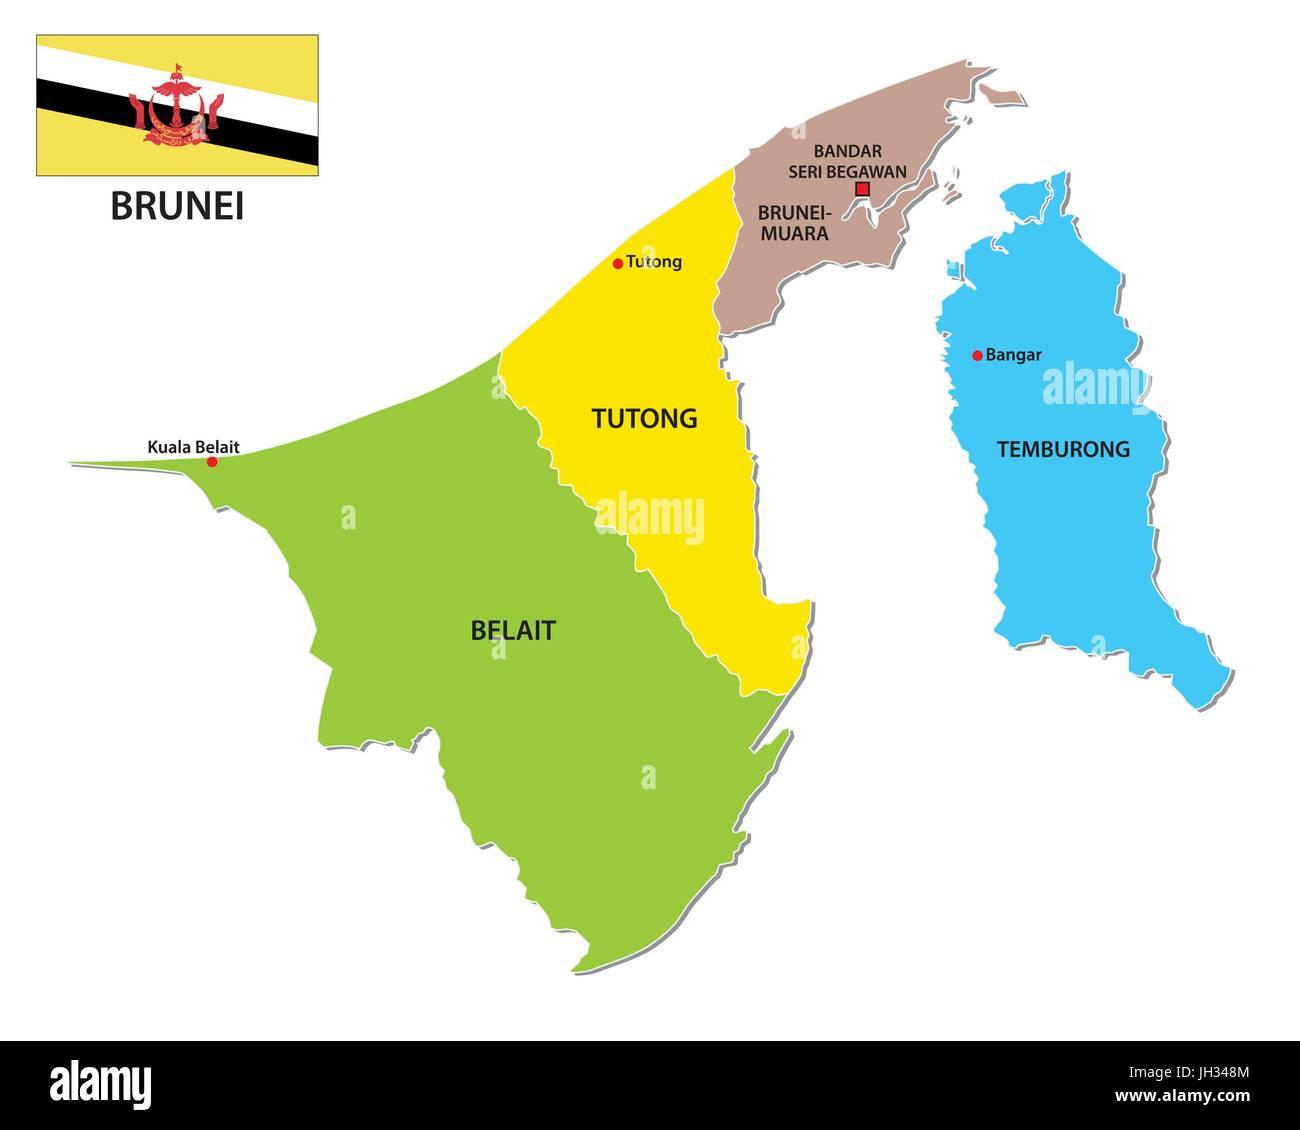 Picture of: Brunei Map Fotos E Imagenes De Stock Alamy